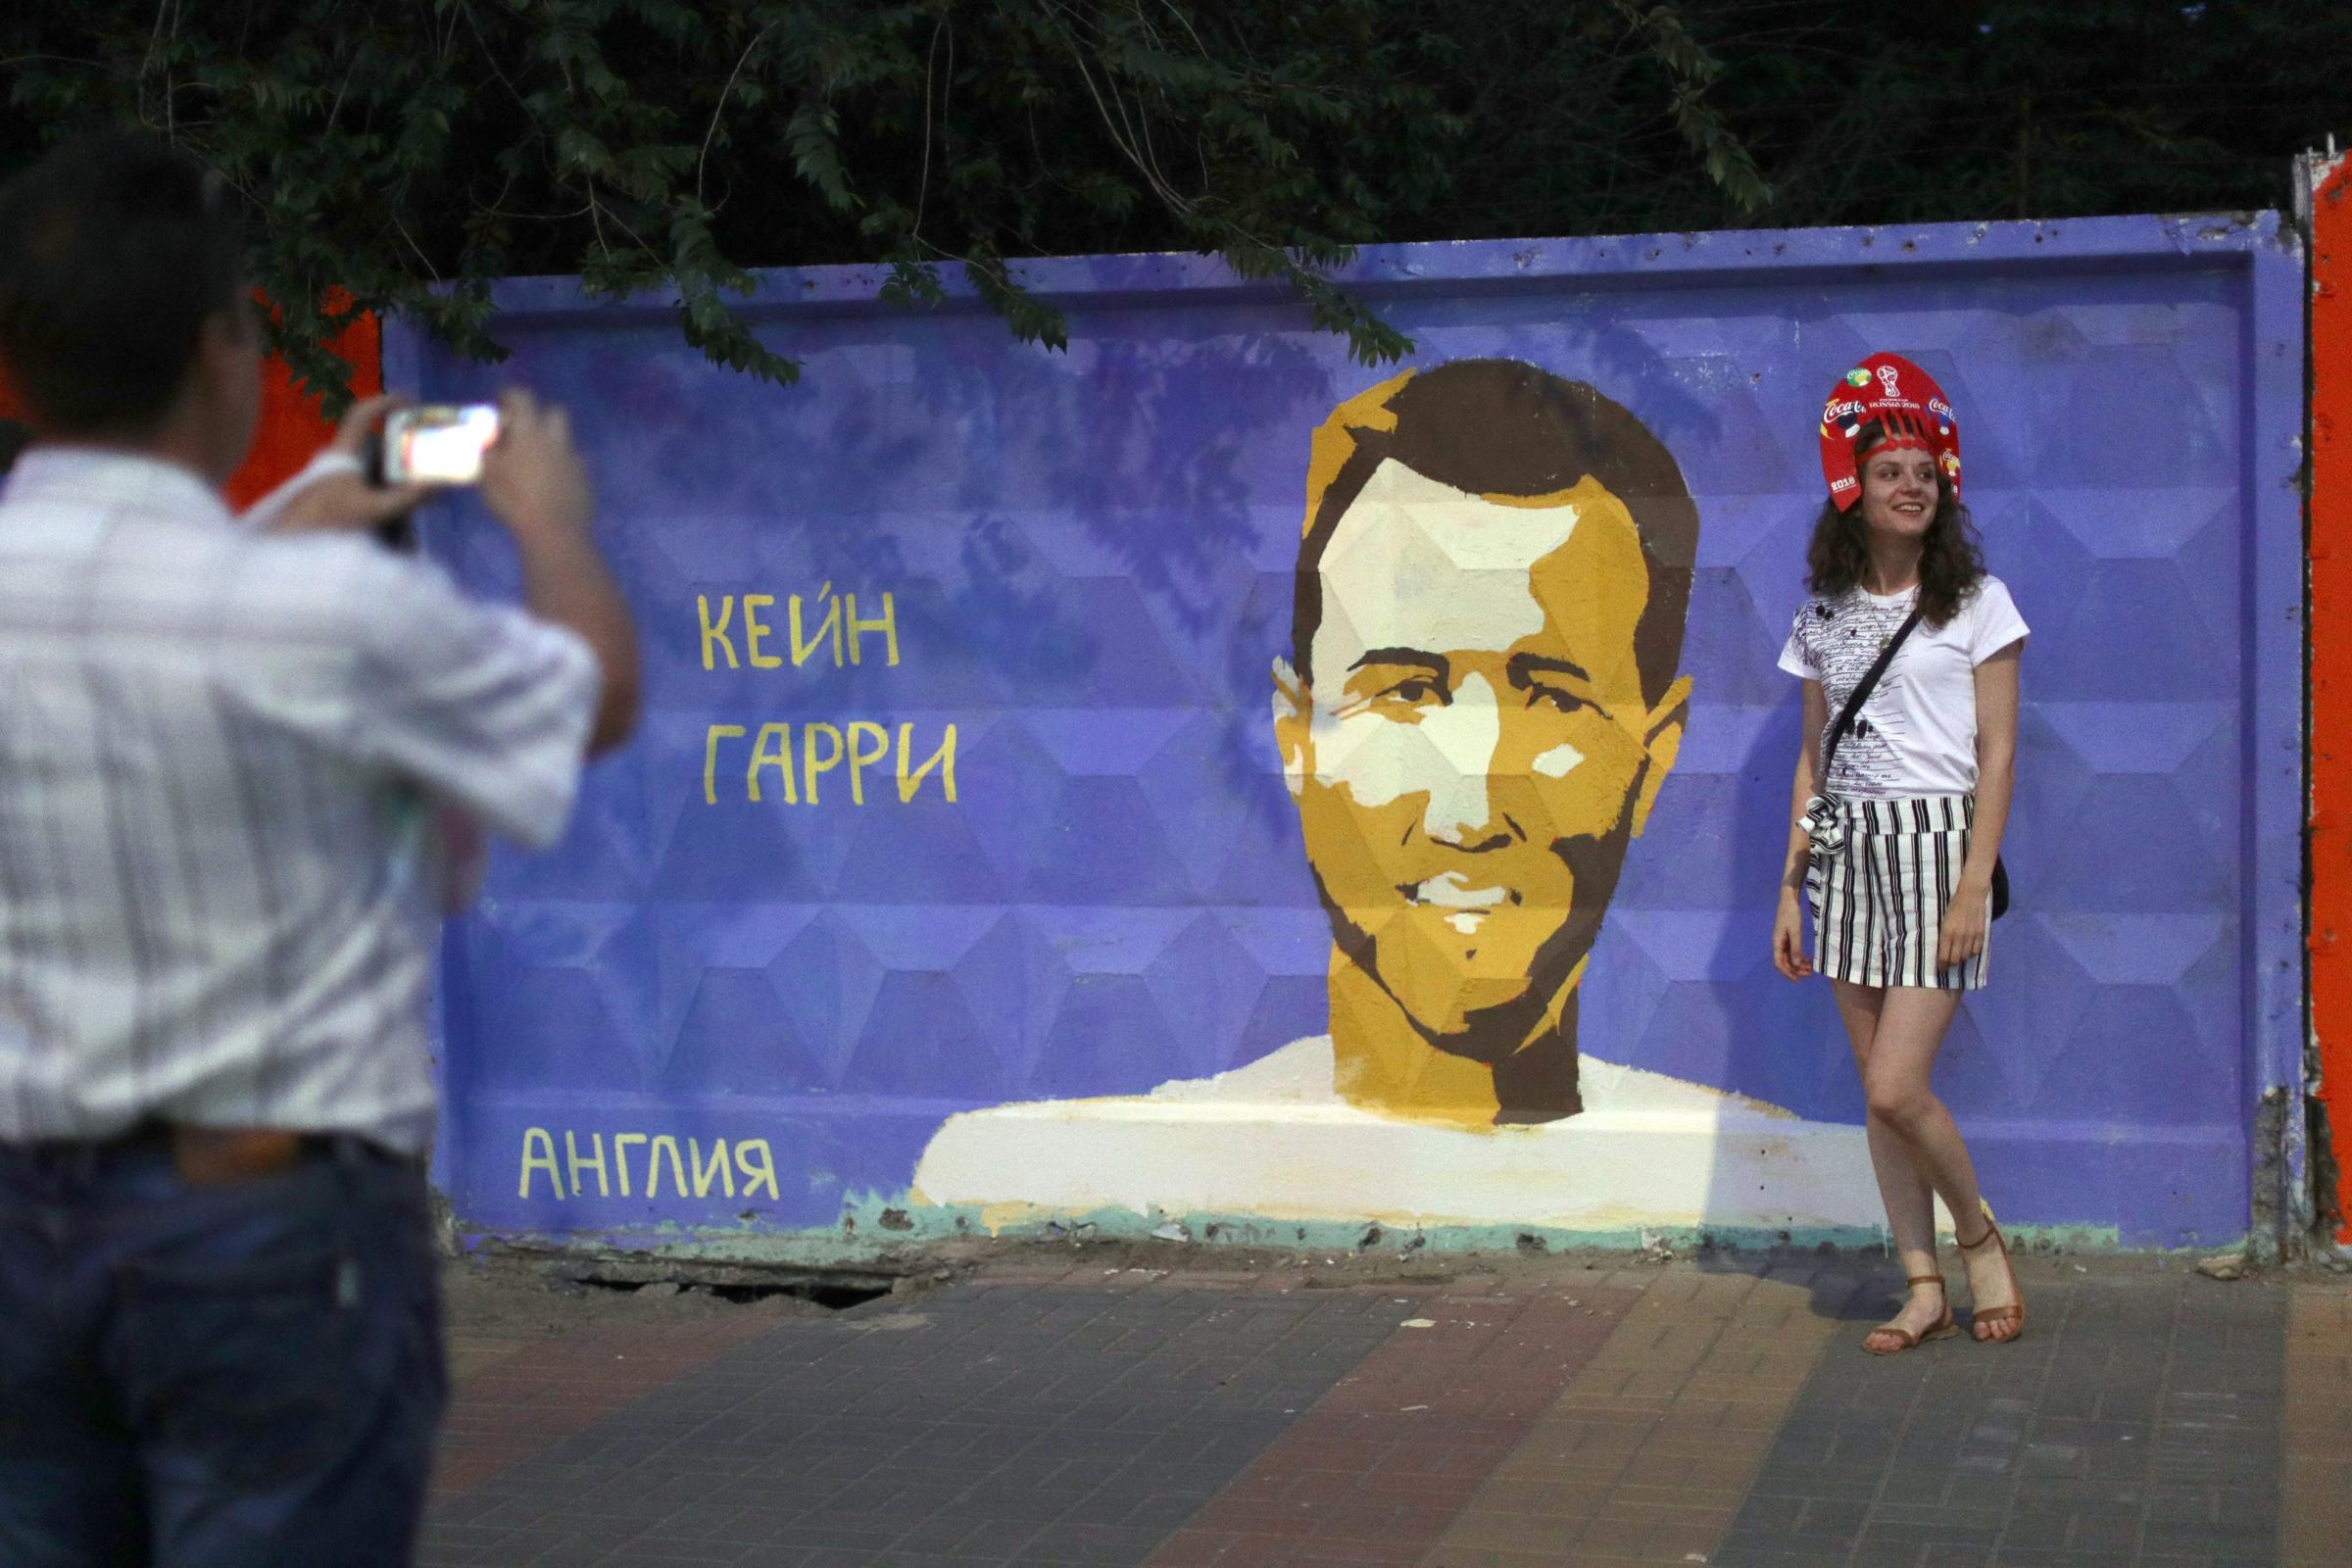 Harry Kane Among Stars Featuring In Volgograd Murals - Somerset